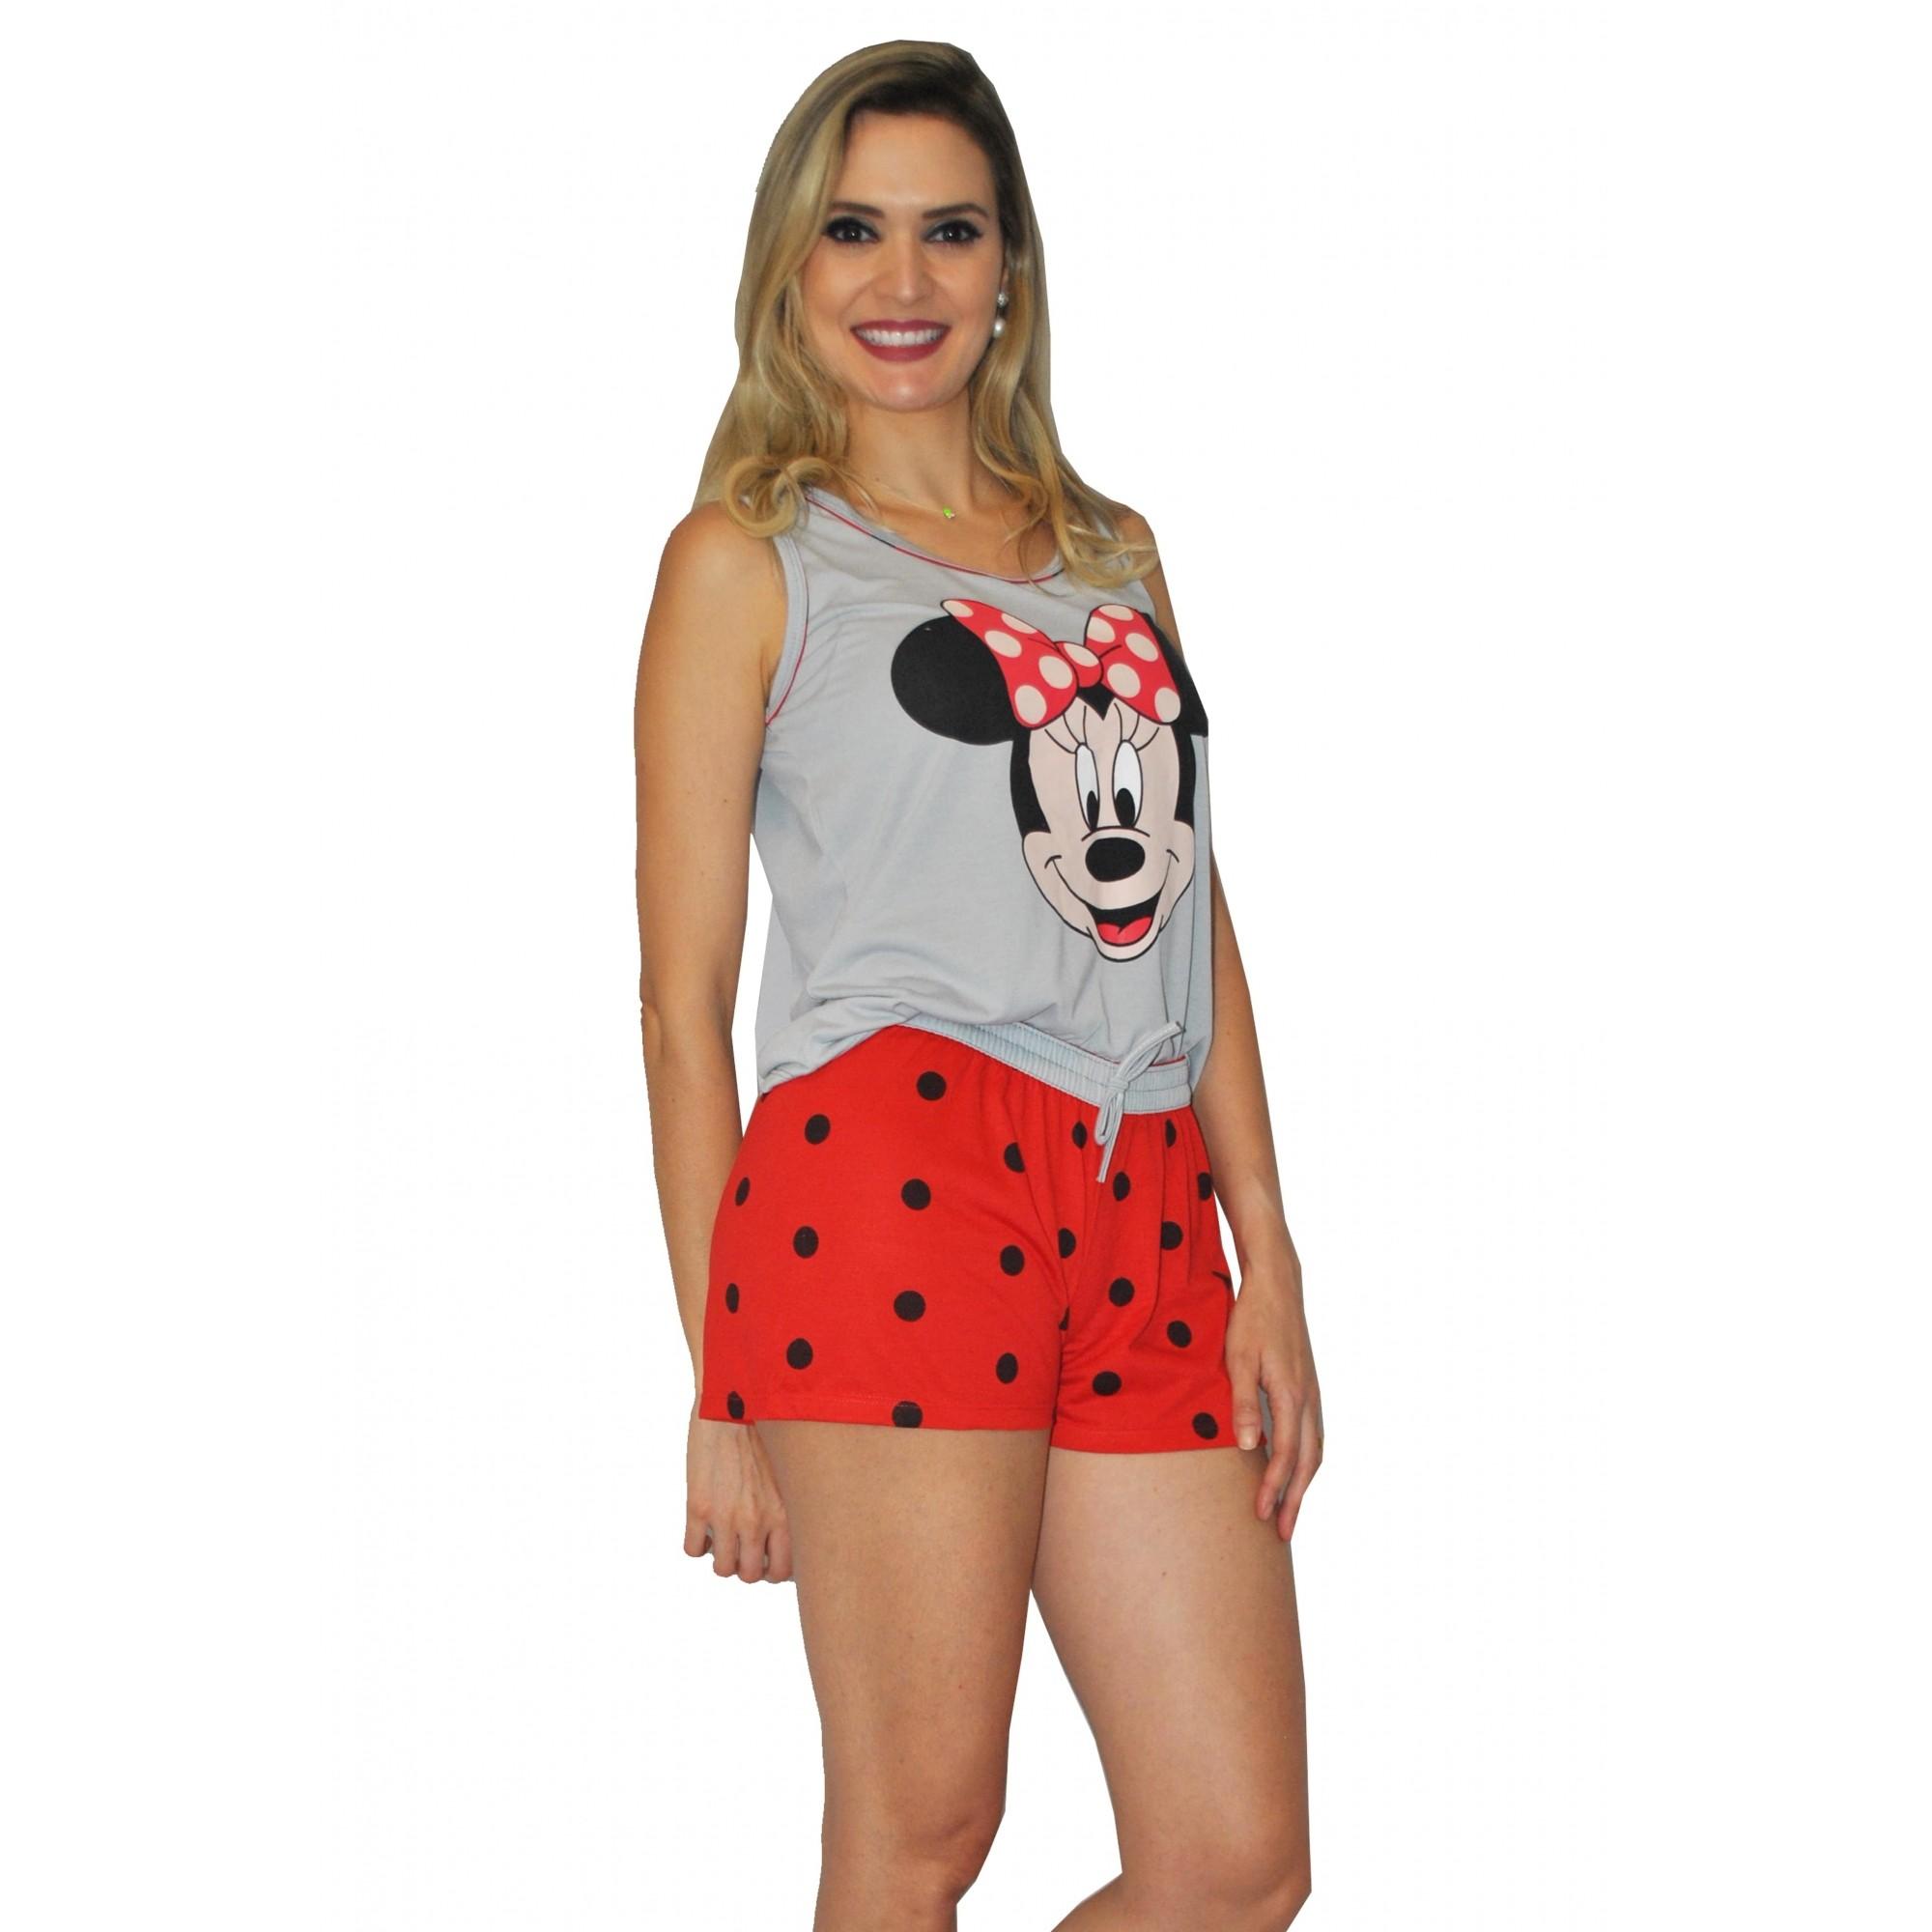 Baby Doll Short Camiseta Feminino Adulto Verão Malha Confortável Ref: 295